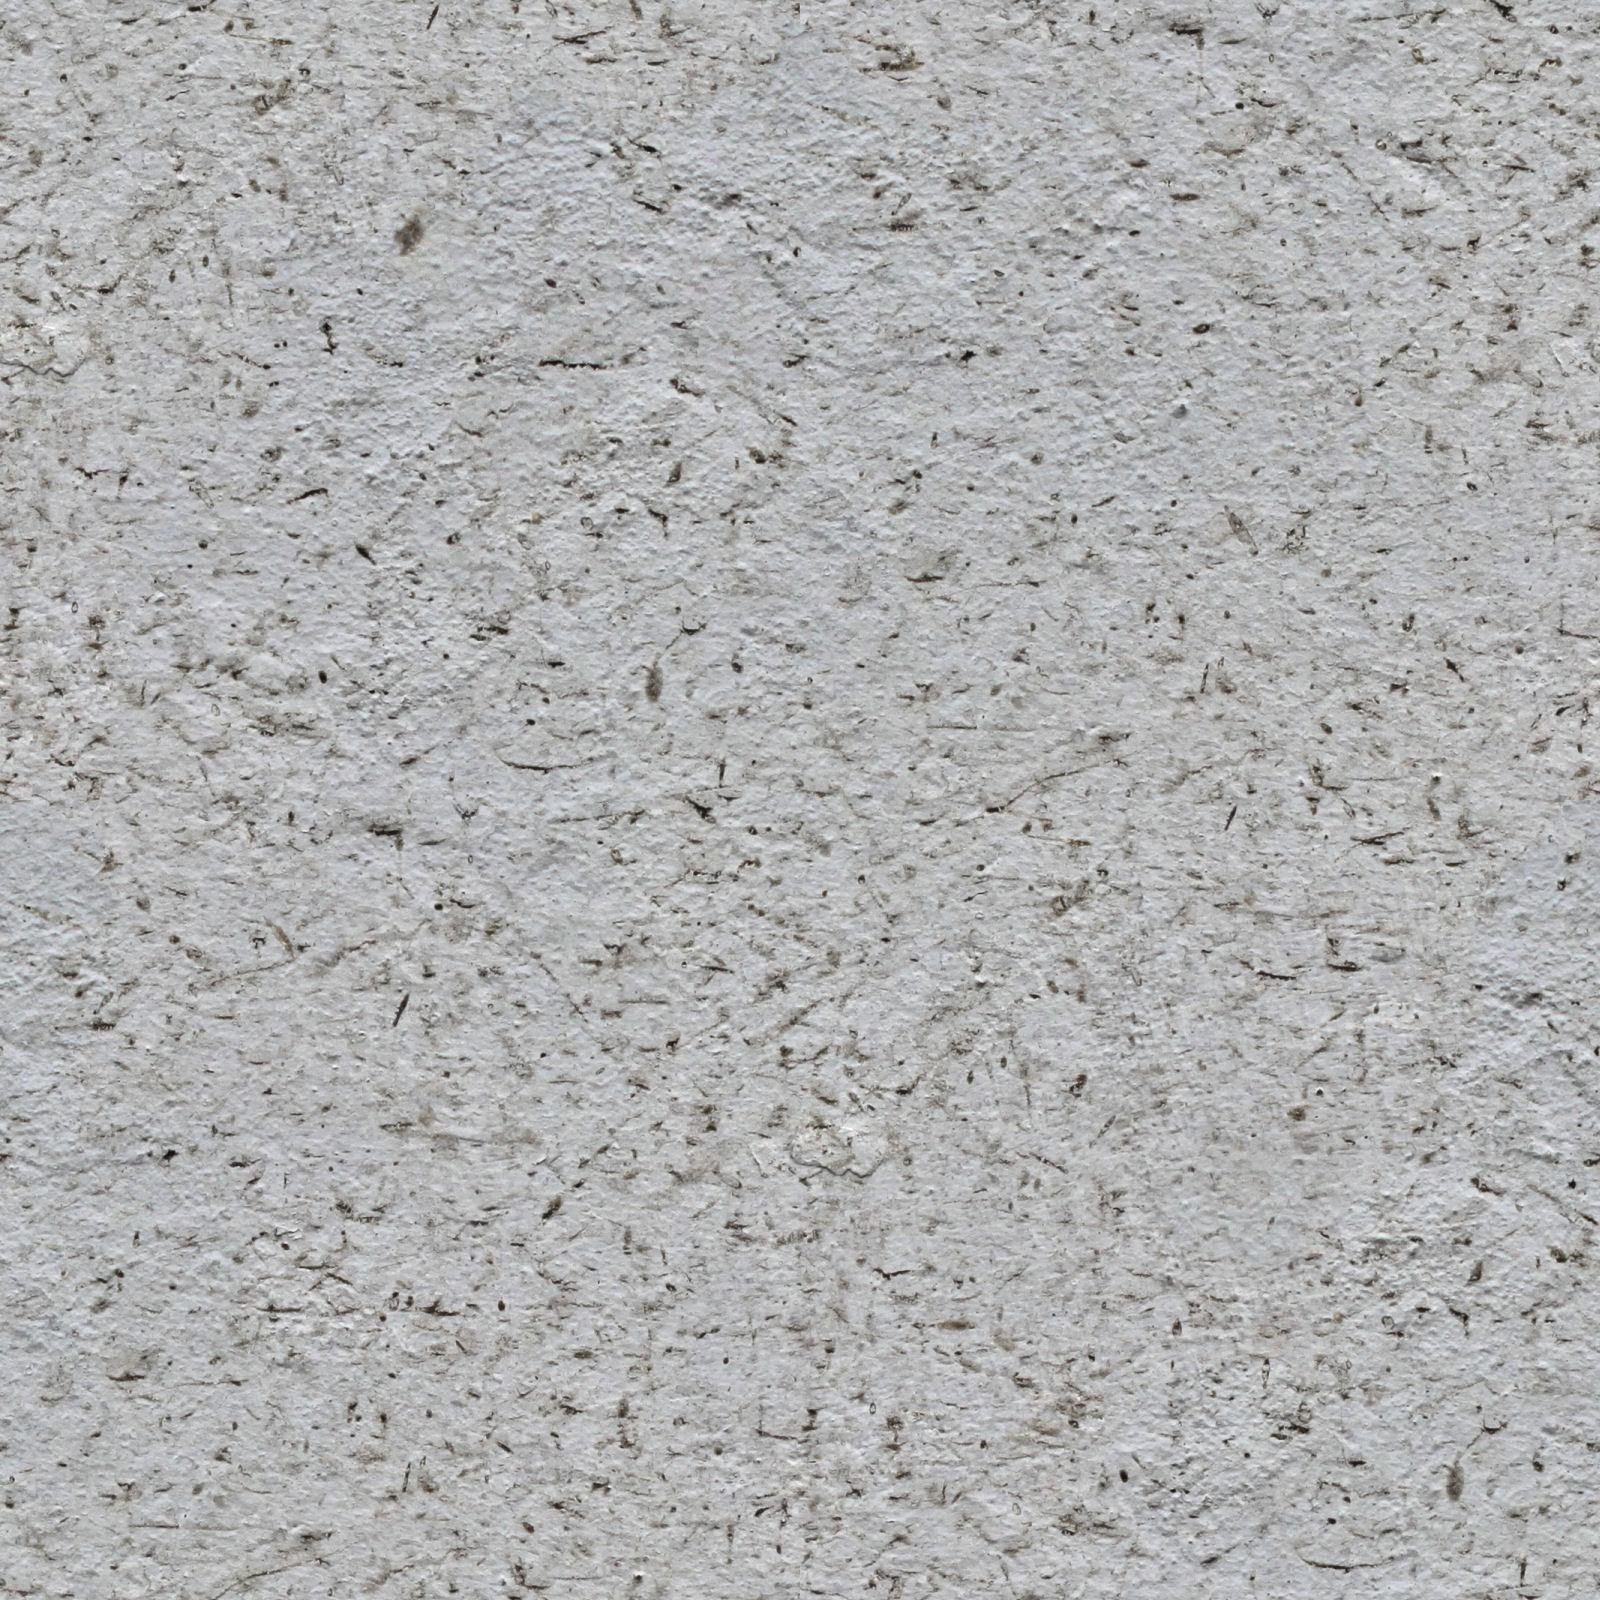 Wall paint texture seamless - High Resolution Seamless Textures Seamless White Wall Texture